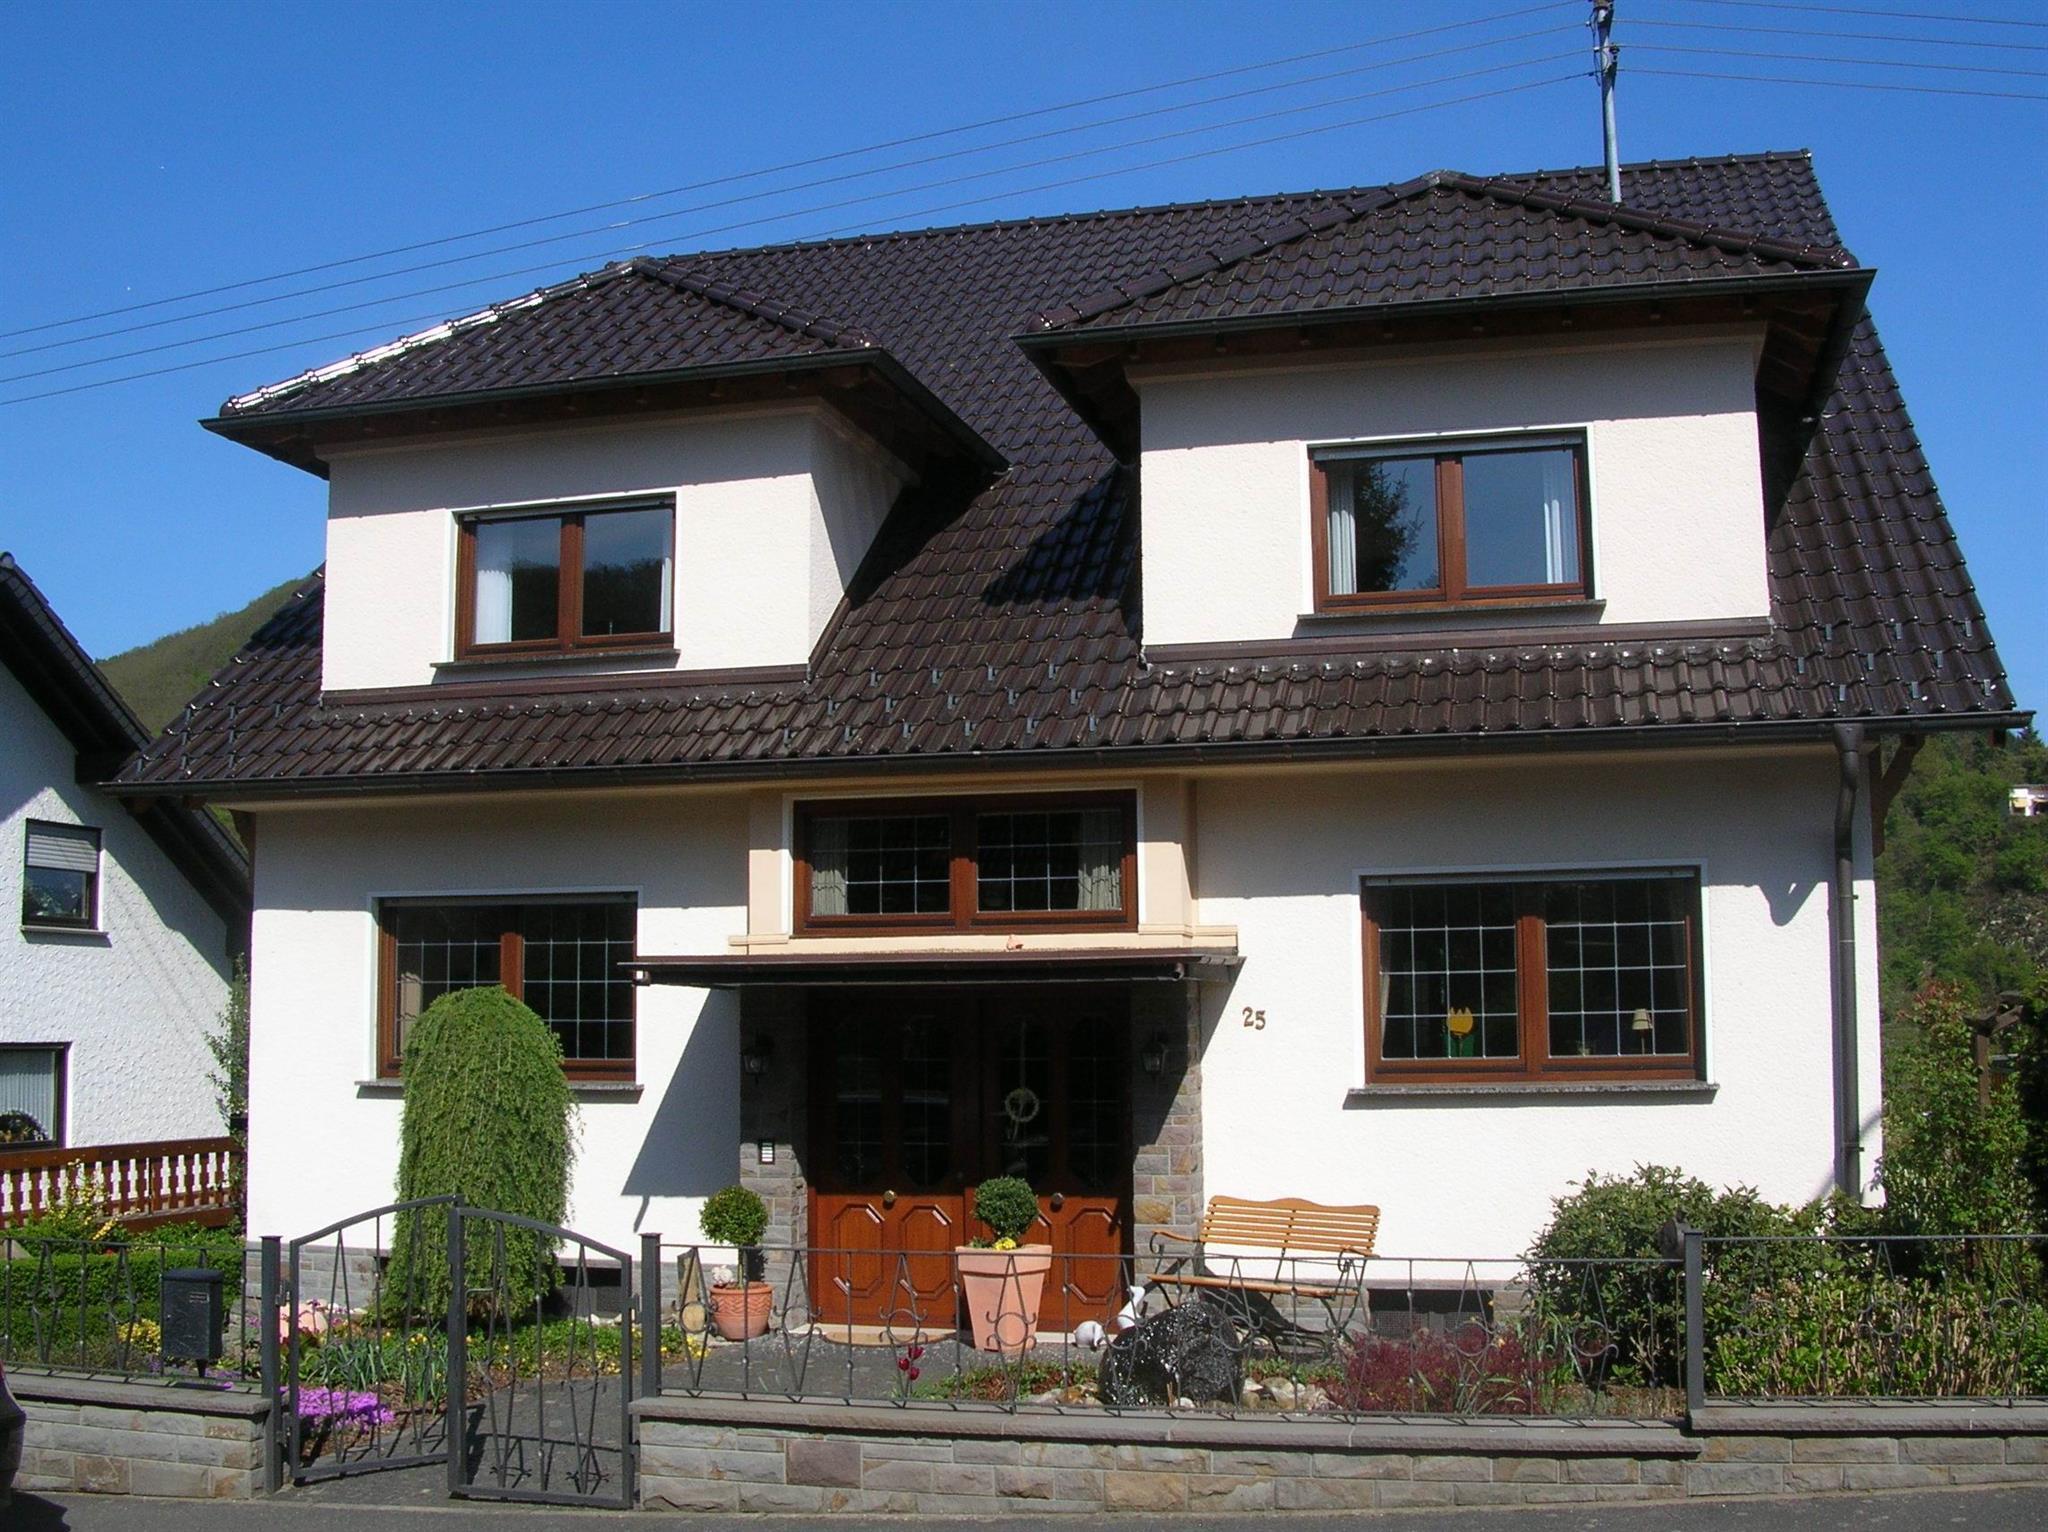 Gästehaus Magdalena, @ HausMagdalena